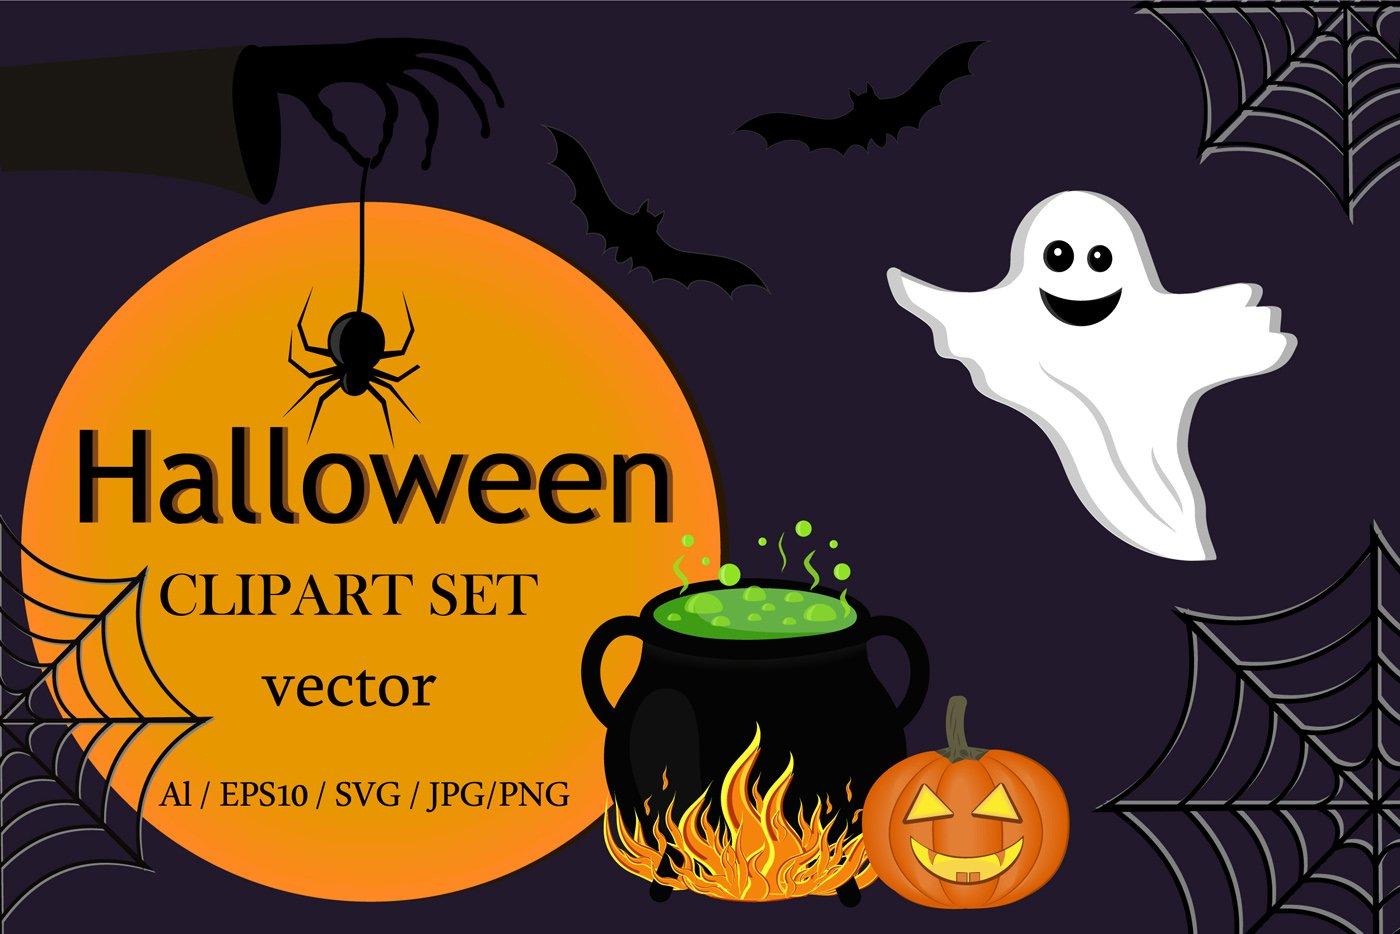 Download Clipart Set Halloween 972588 Illustrations Design Bundles